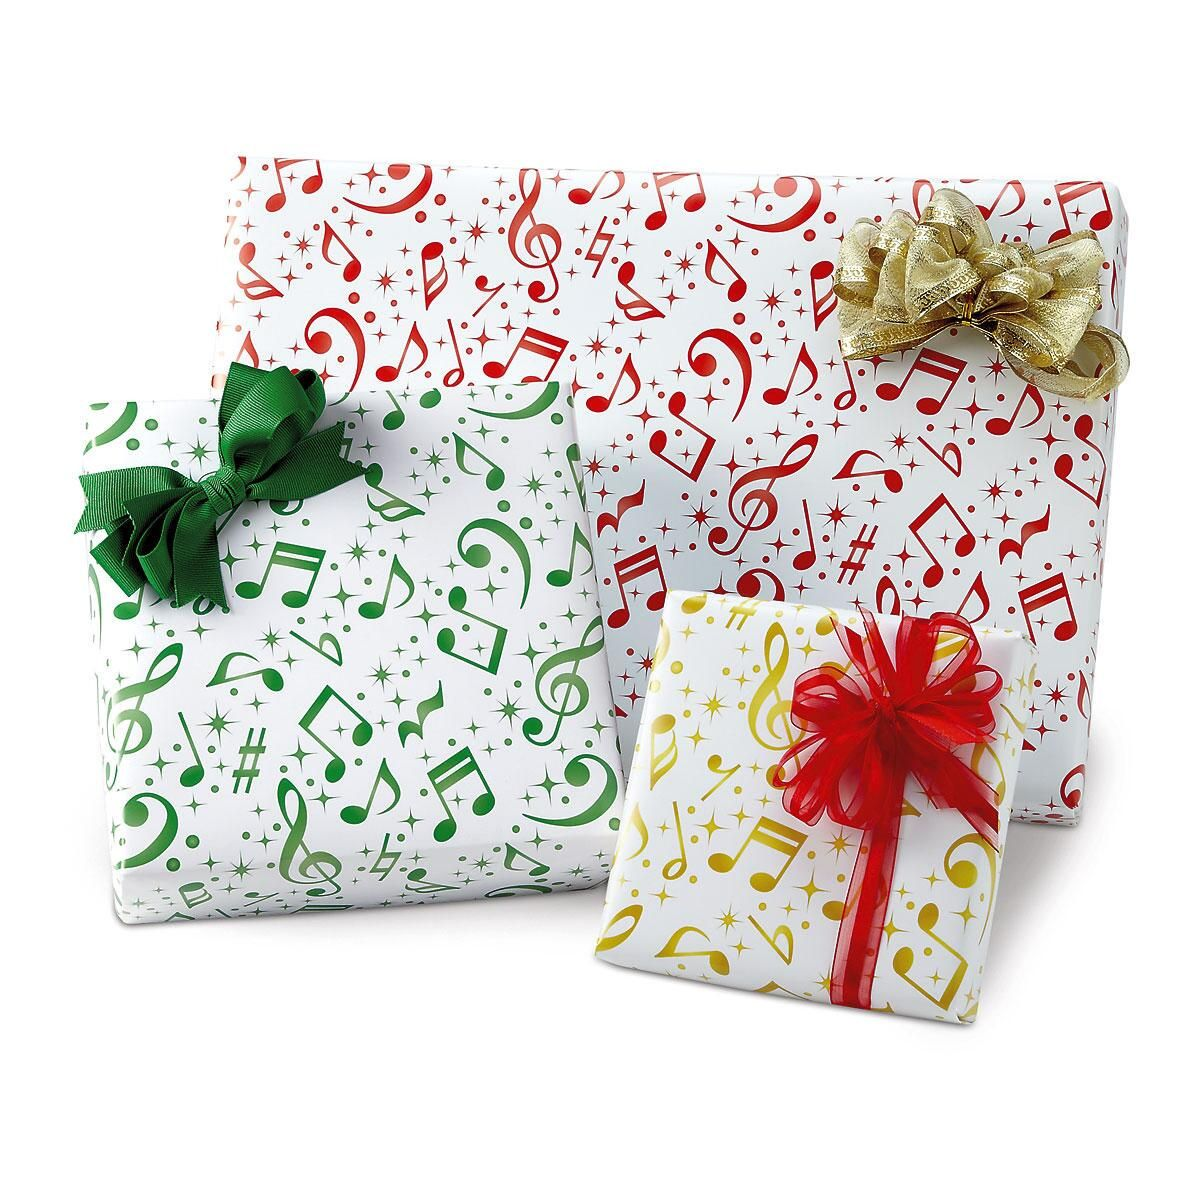 music flat gift wrap sheets current catalog. Black Bedroom Furniture Sets. Home Design Ideas